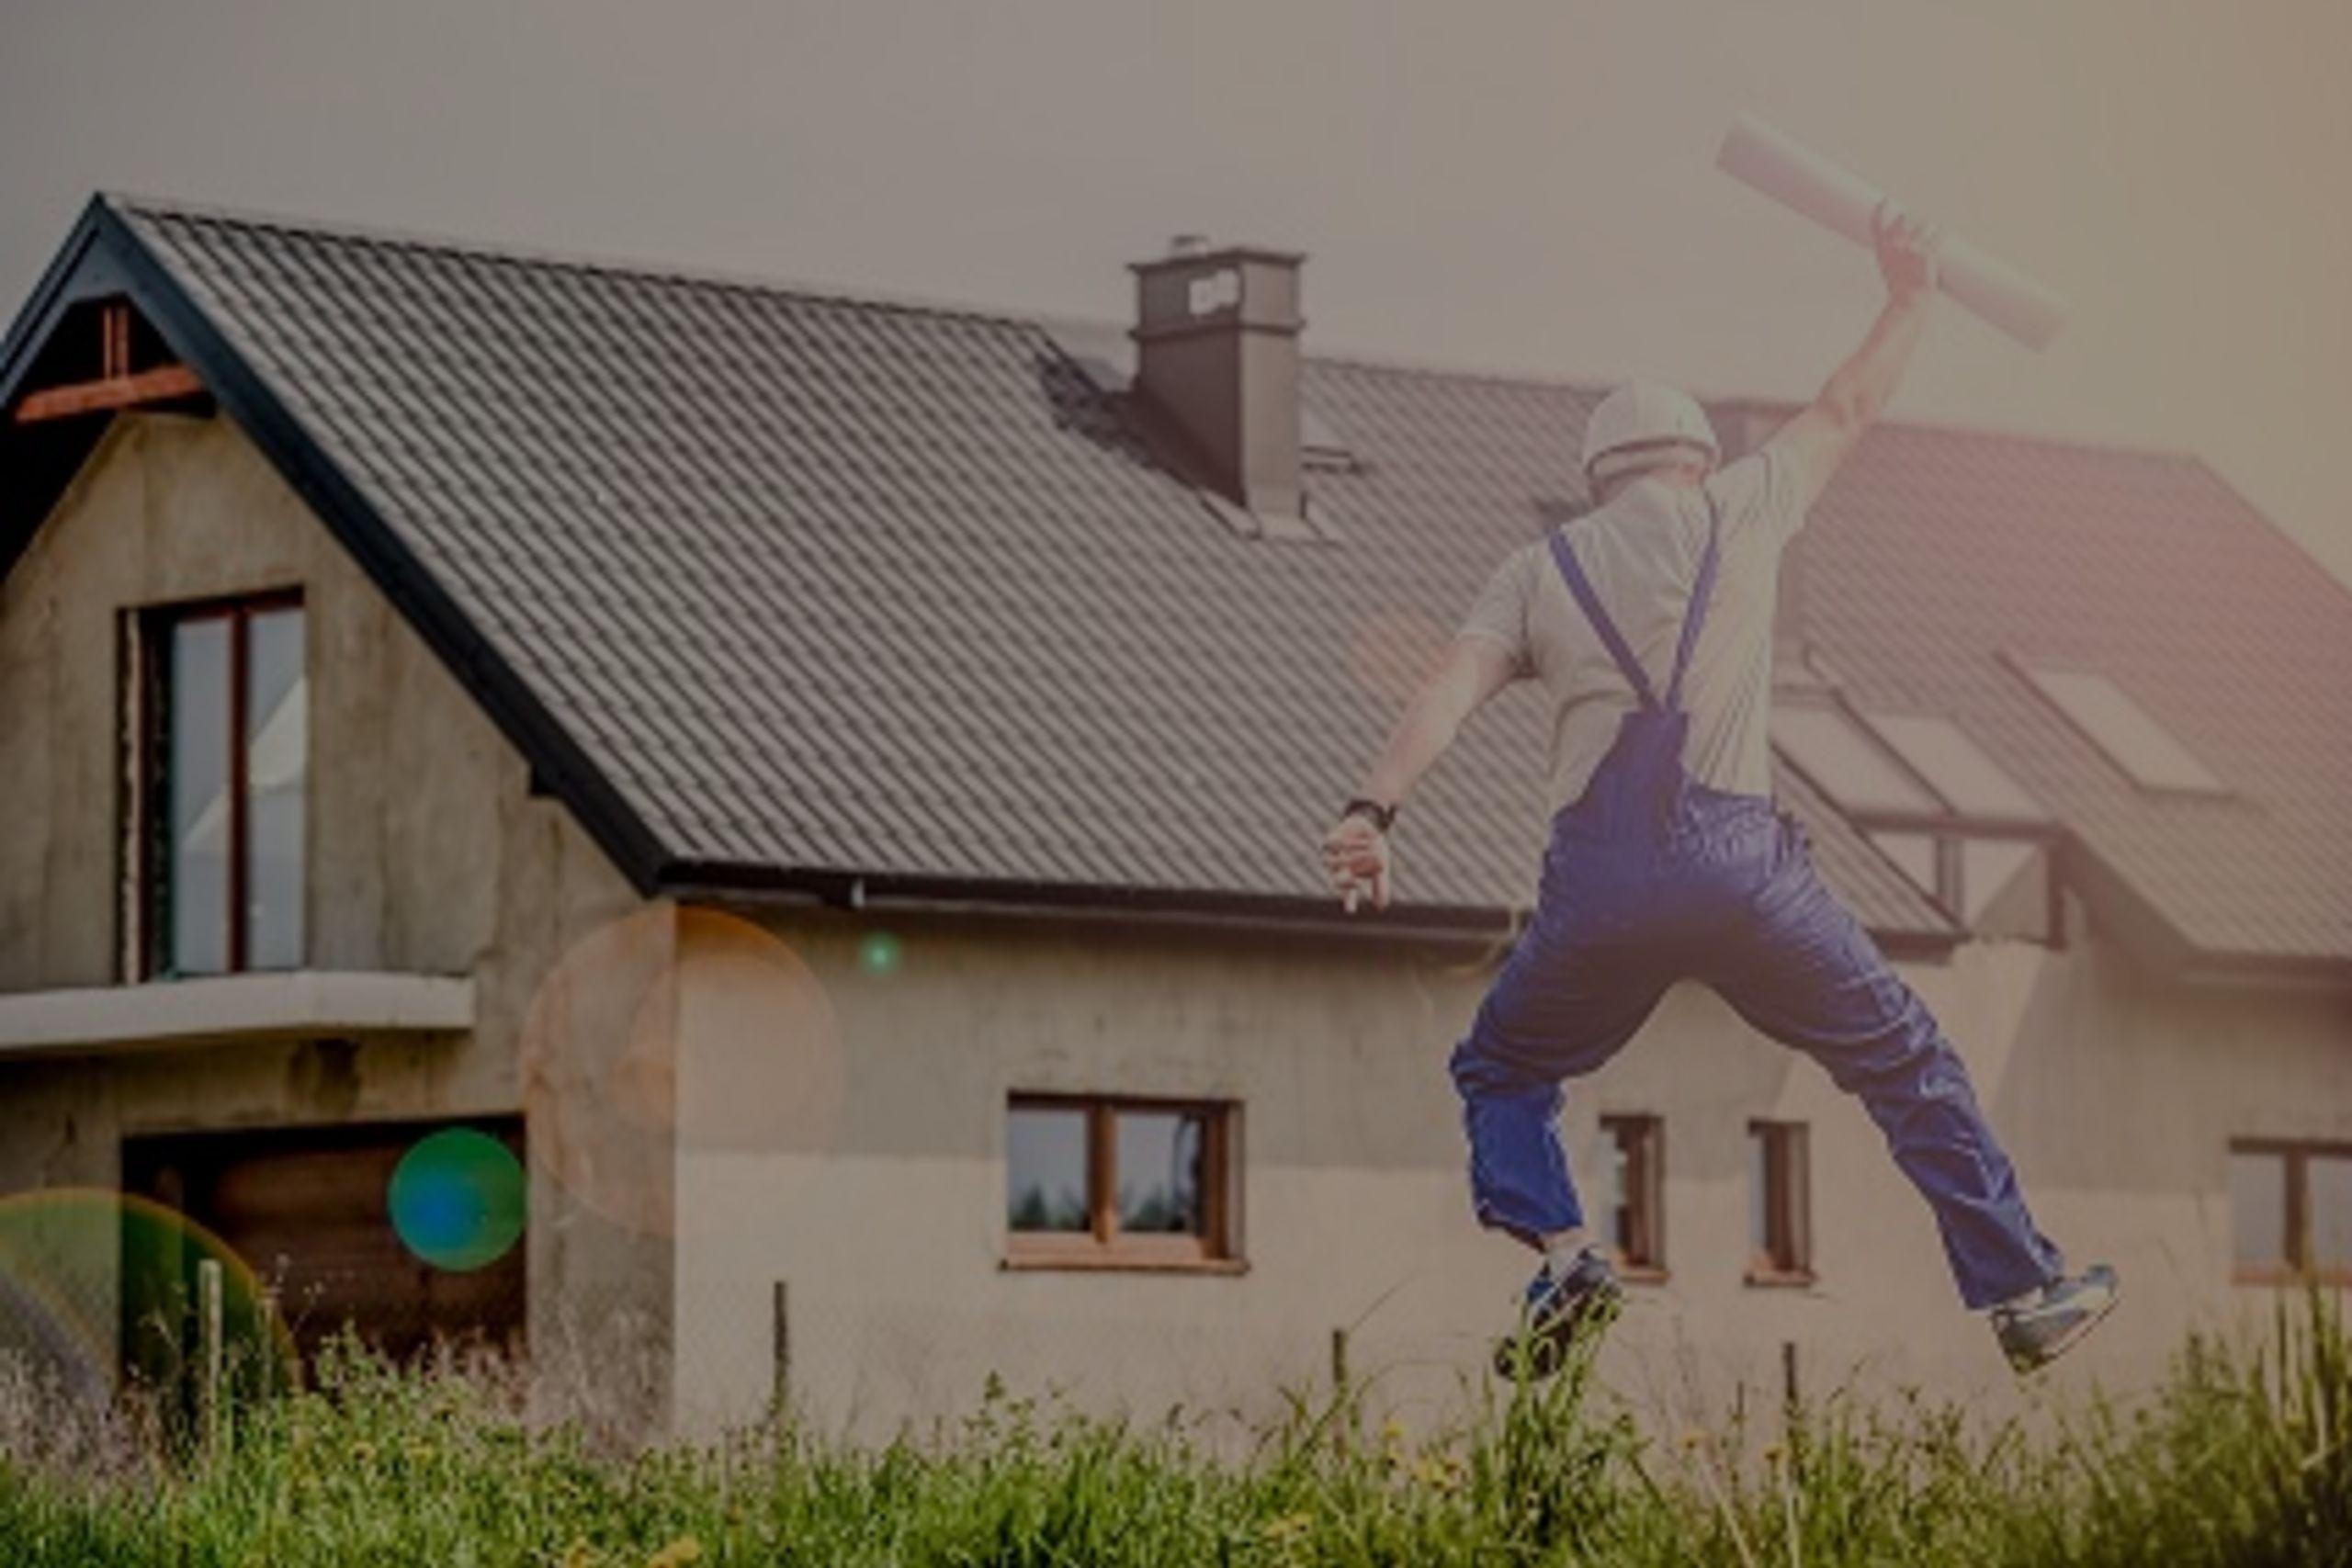 Homebuilder optimism hits 18-year high